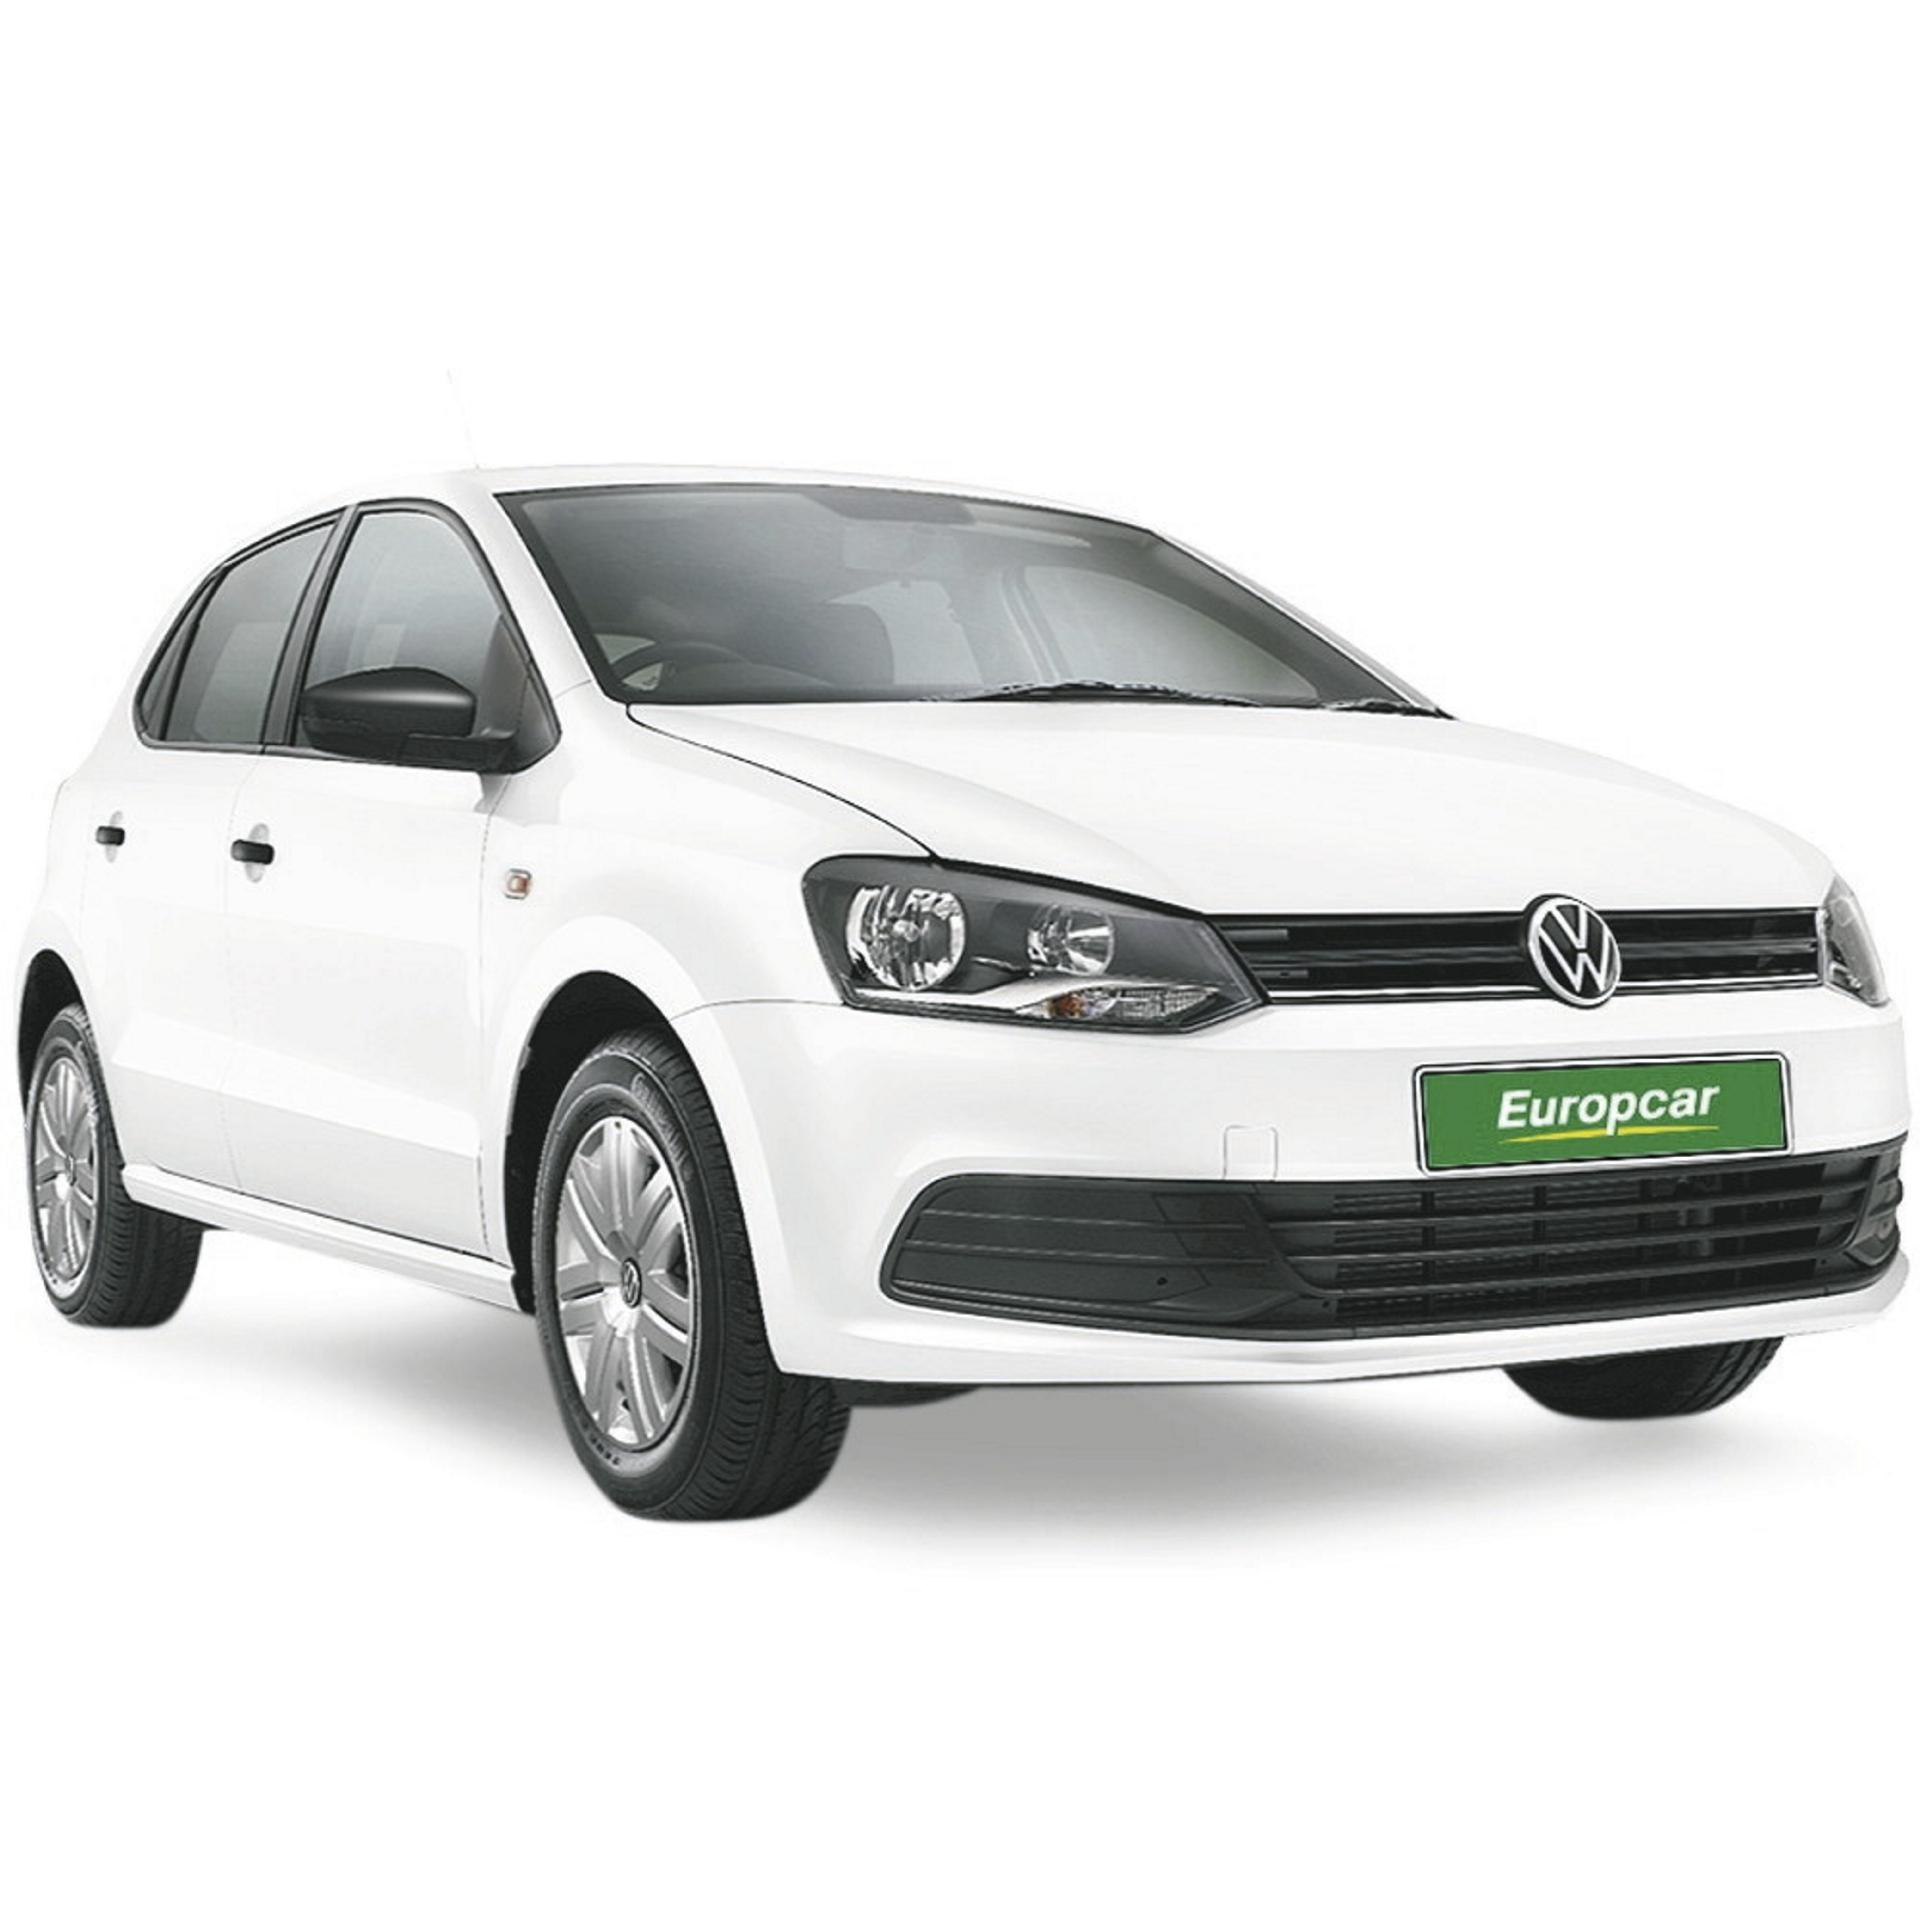 Gruppe B, VW Polo o.ä.